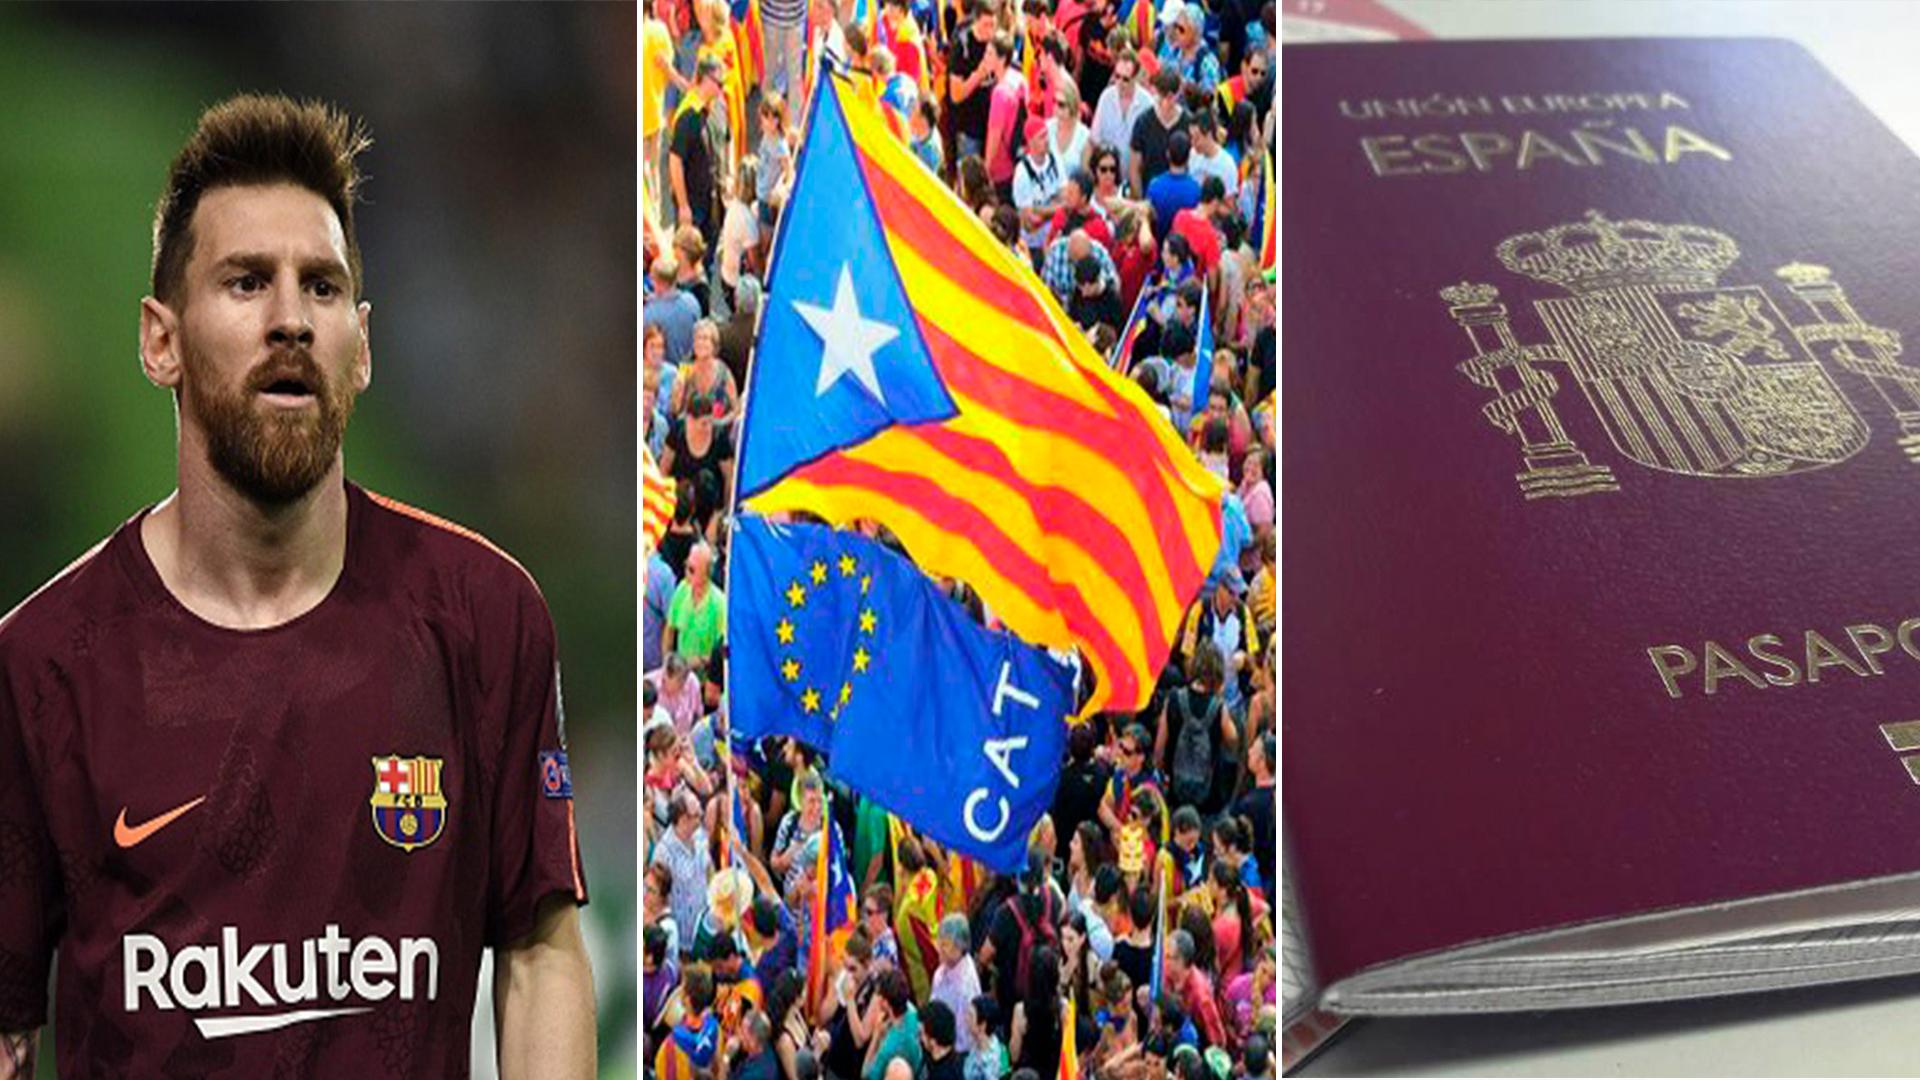 Conflicto catalán solo concierne a España, afirma Comisión Europea